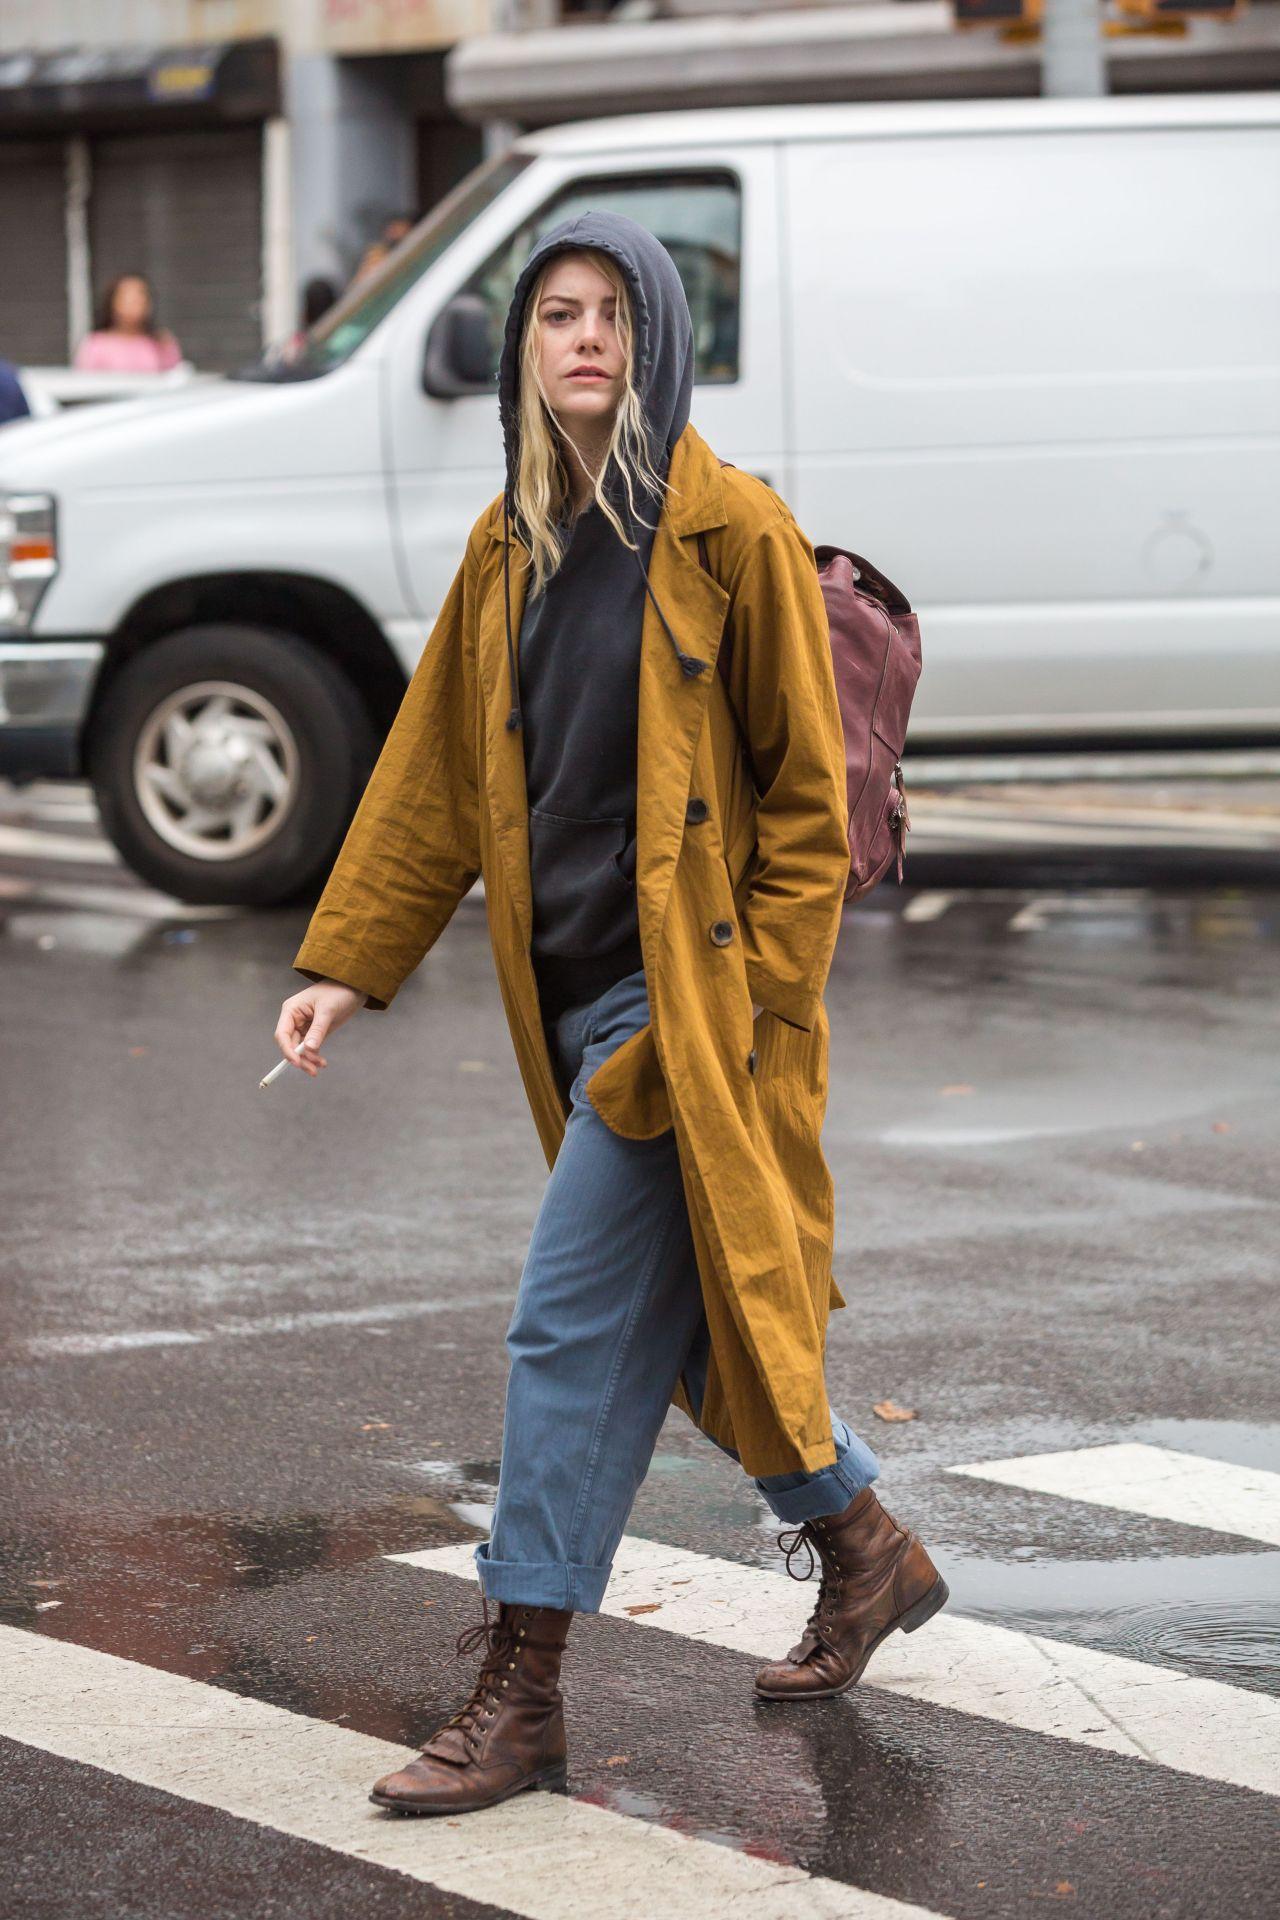 Emma Stone Quot Maniac Quot Set In Downtown Manhattan 08 14 2017